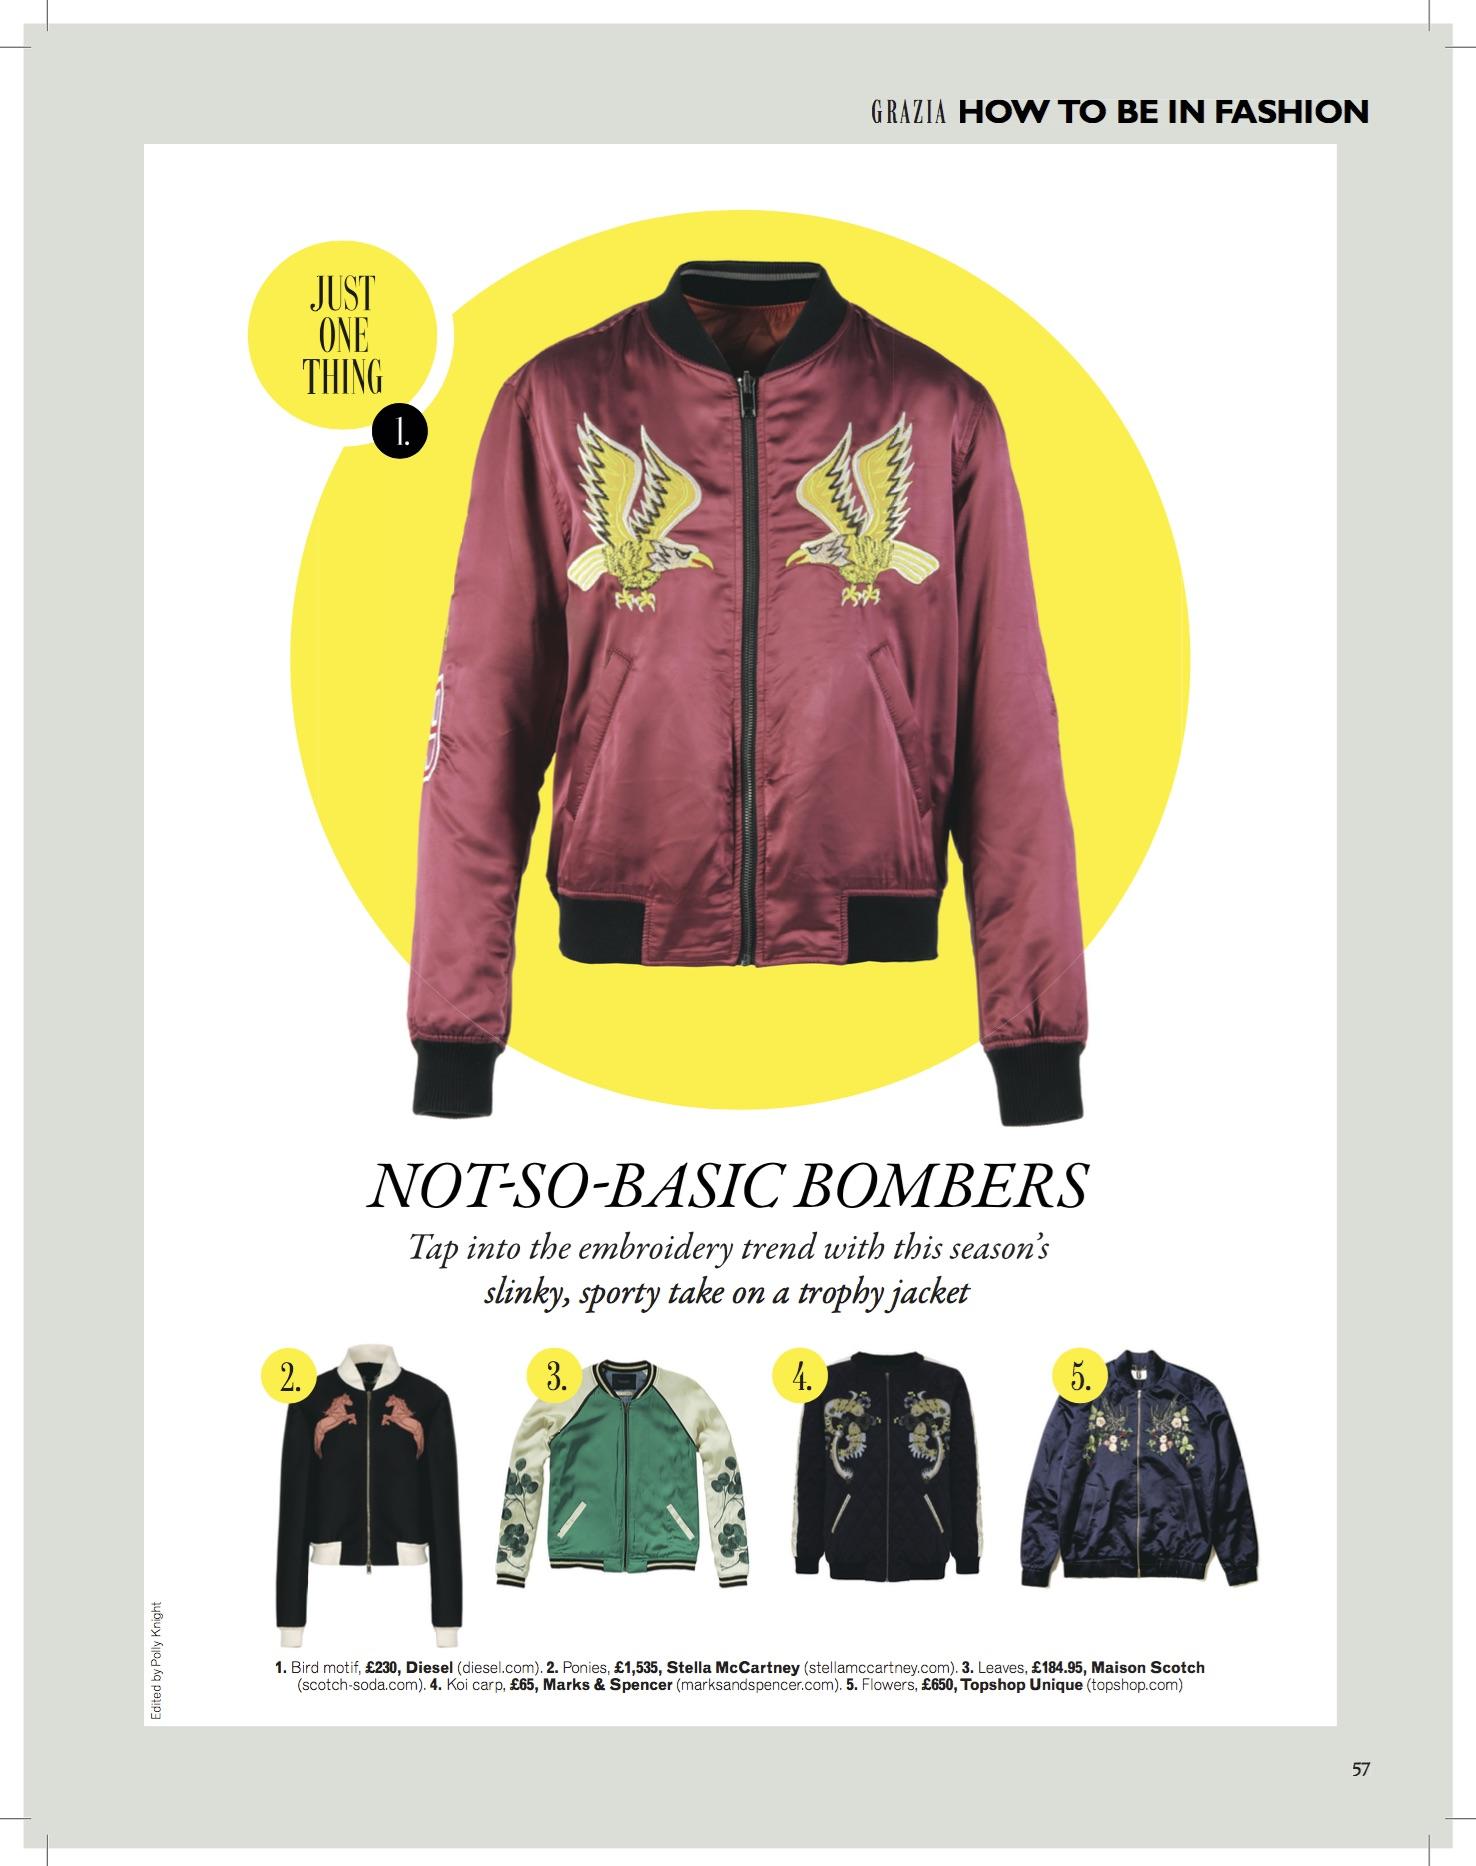 Fashion_JustOneThing Silk Bomber_pdf_1 copy.jpg